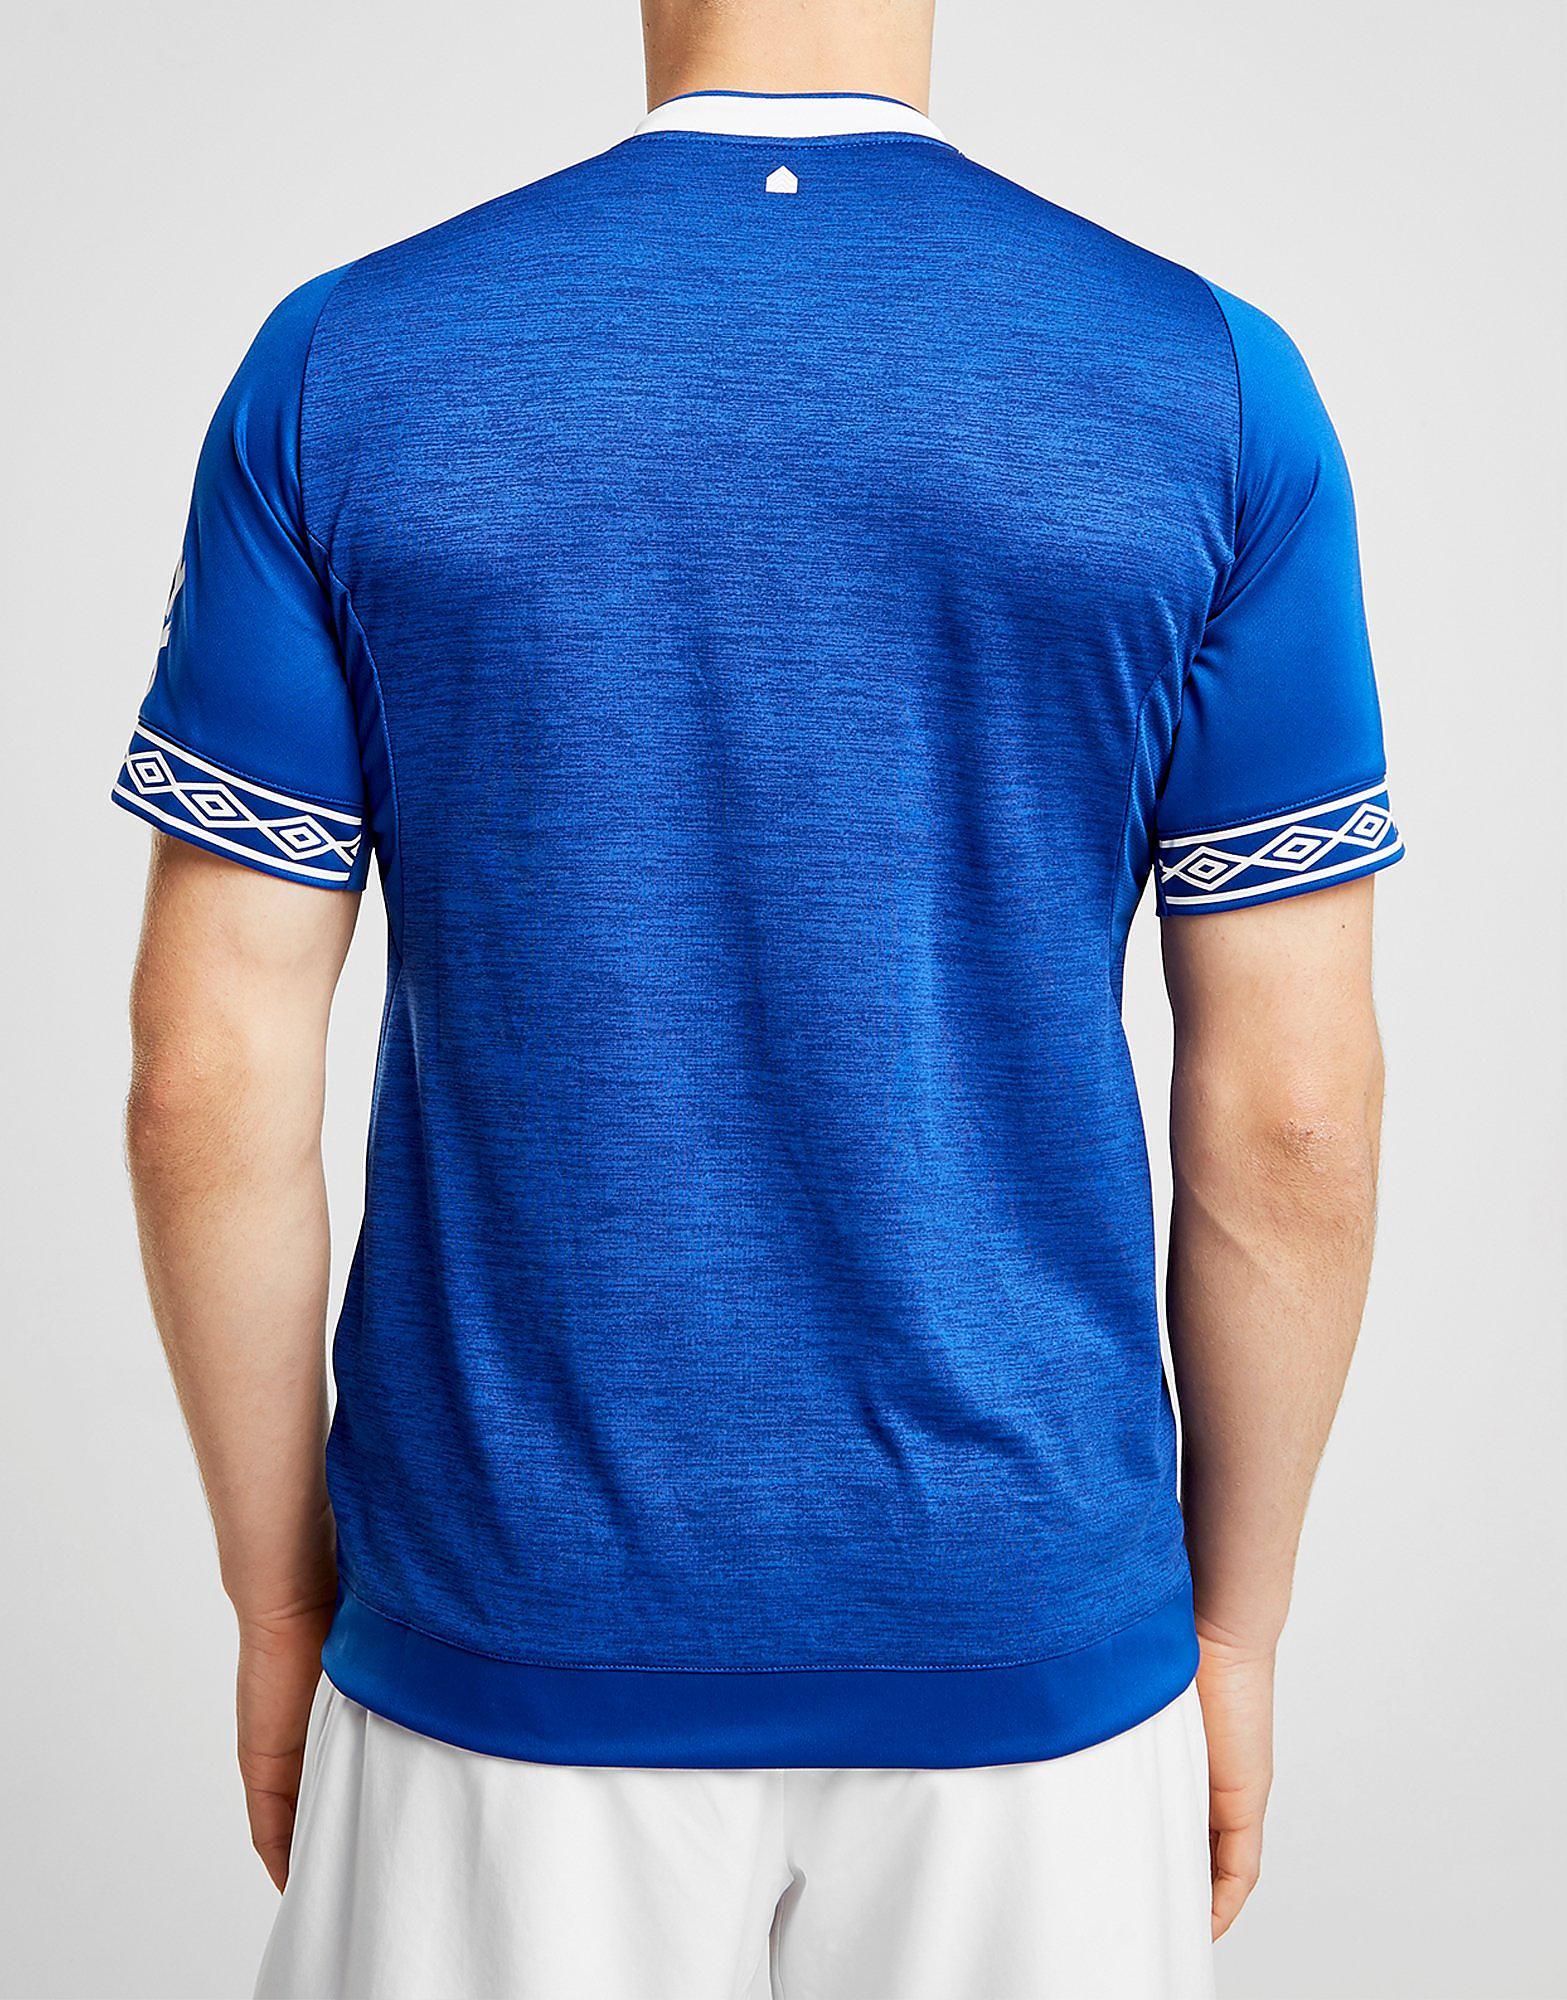 Umbro Everton FC 2018/19 Home Shirt Heren